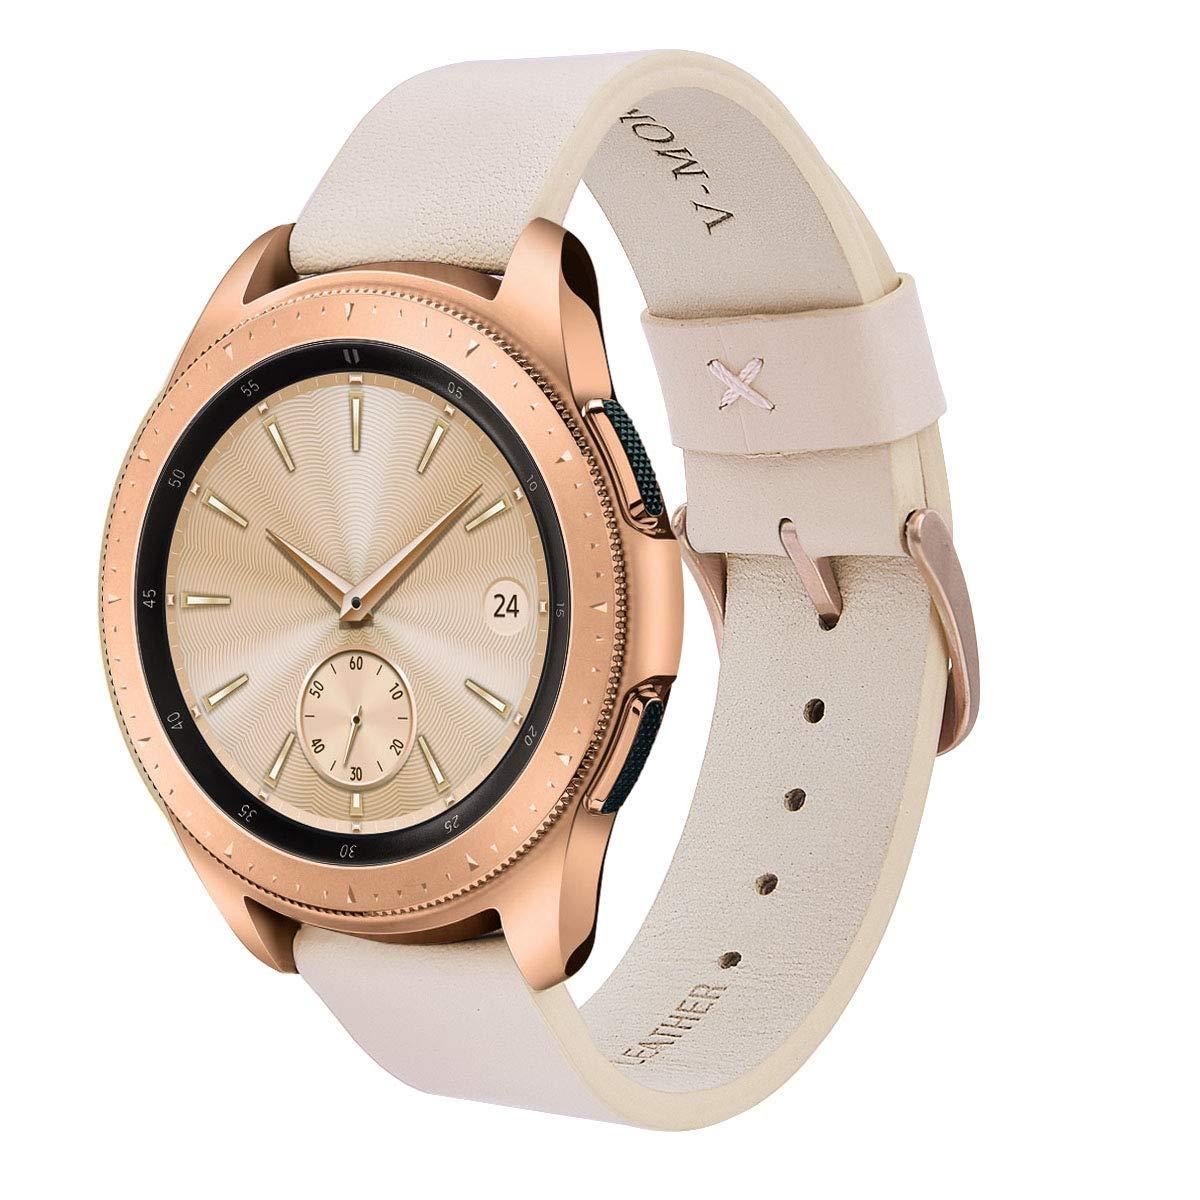 Malla para Galaxy Watch3 / Active2 Beige crema -7WGT3SVD